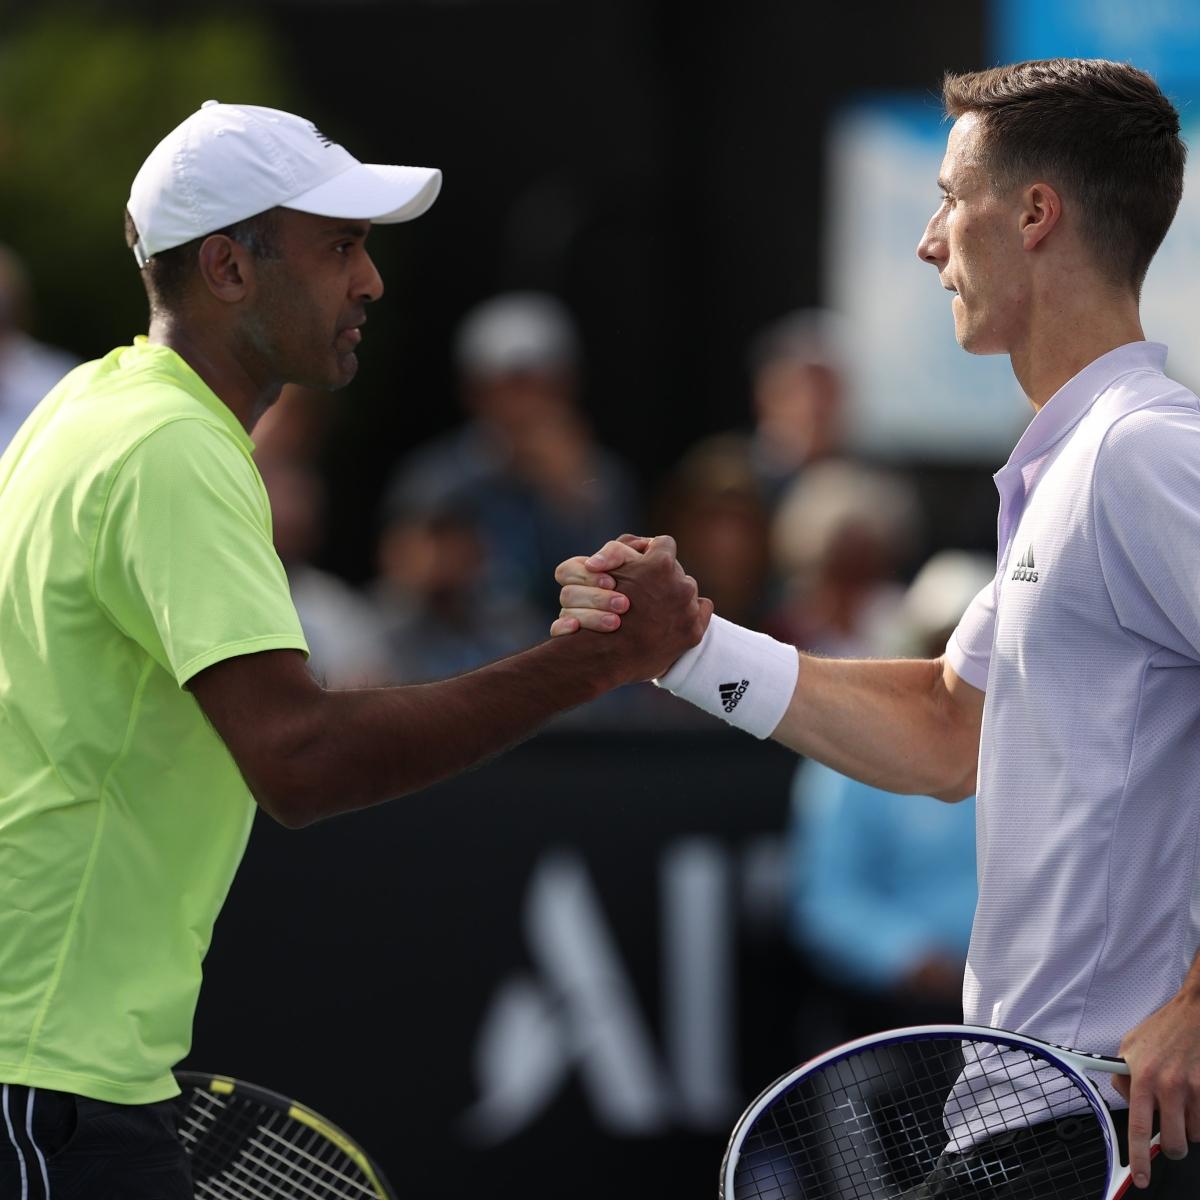 Australian Open: Rajeev Ram and Joe Salisbury clinch their first men's doubles title